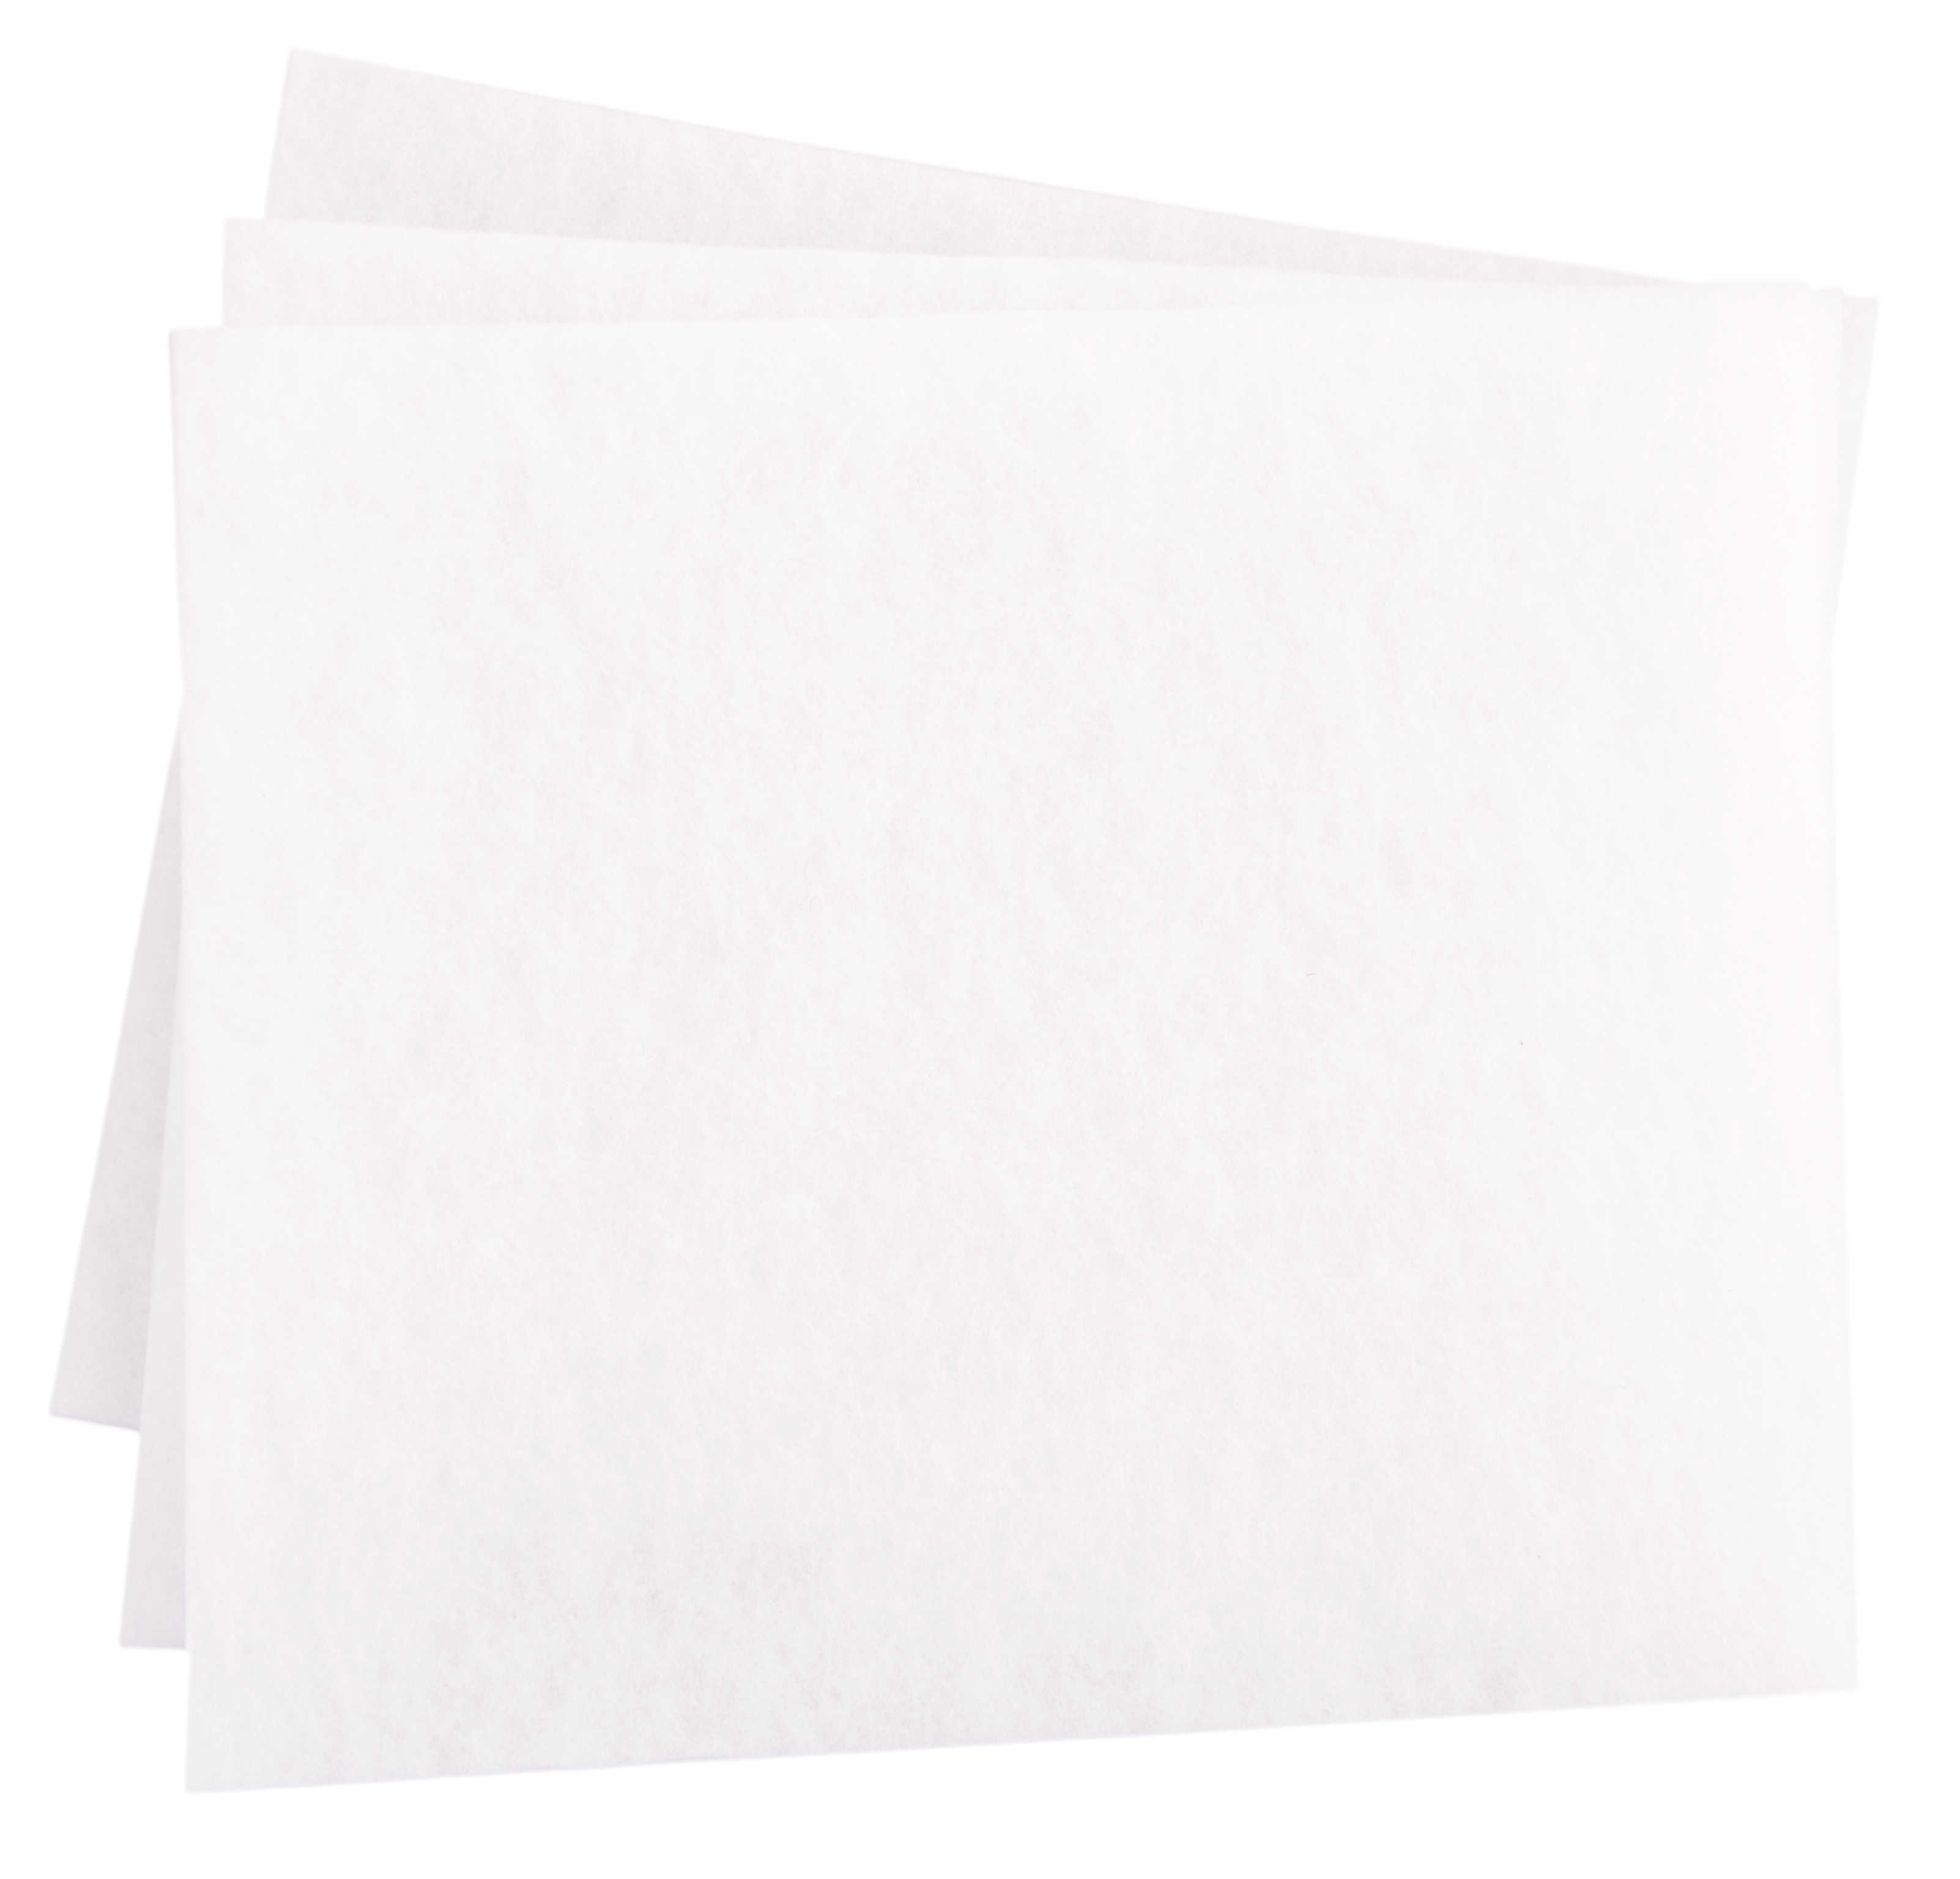 Acetec Filter EvoDry 12 3-pack